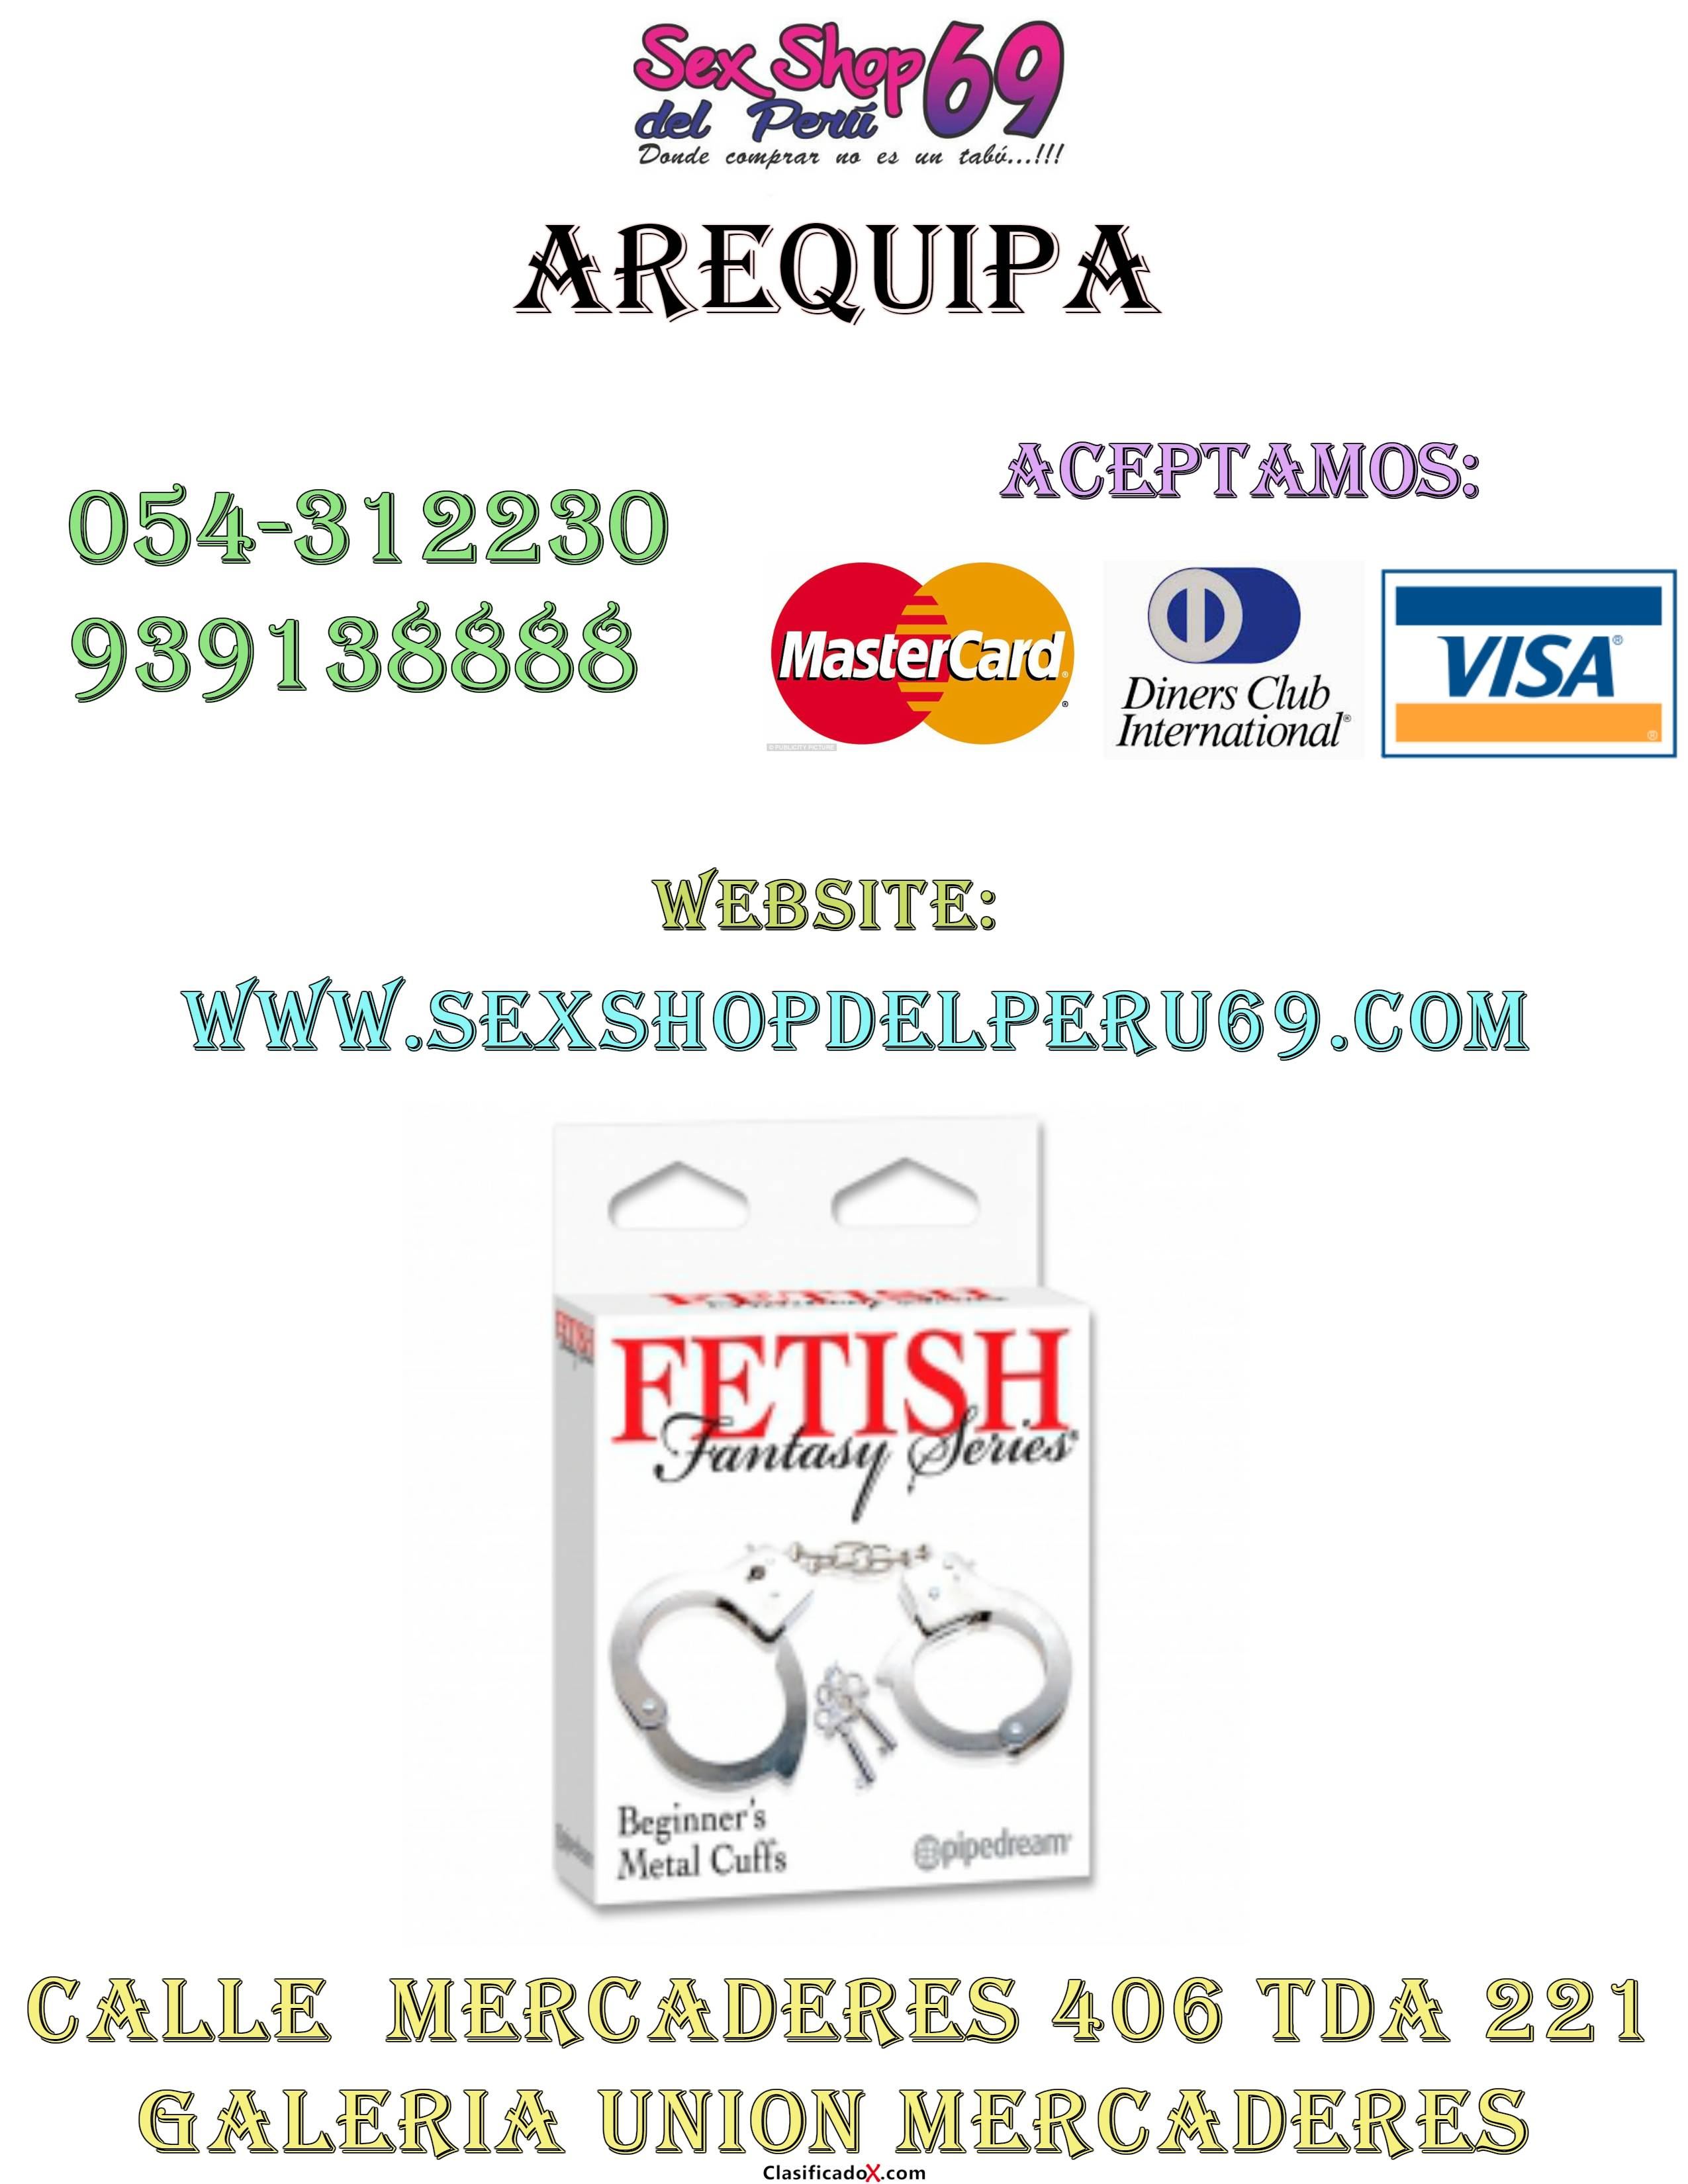 arequipa sexshop-telf..:054-312230